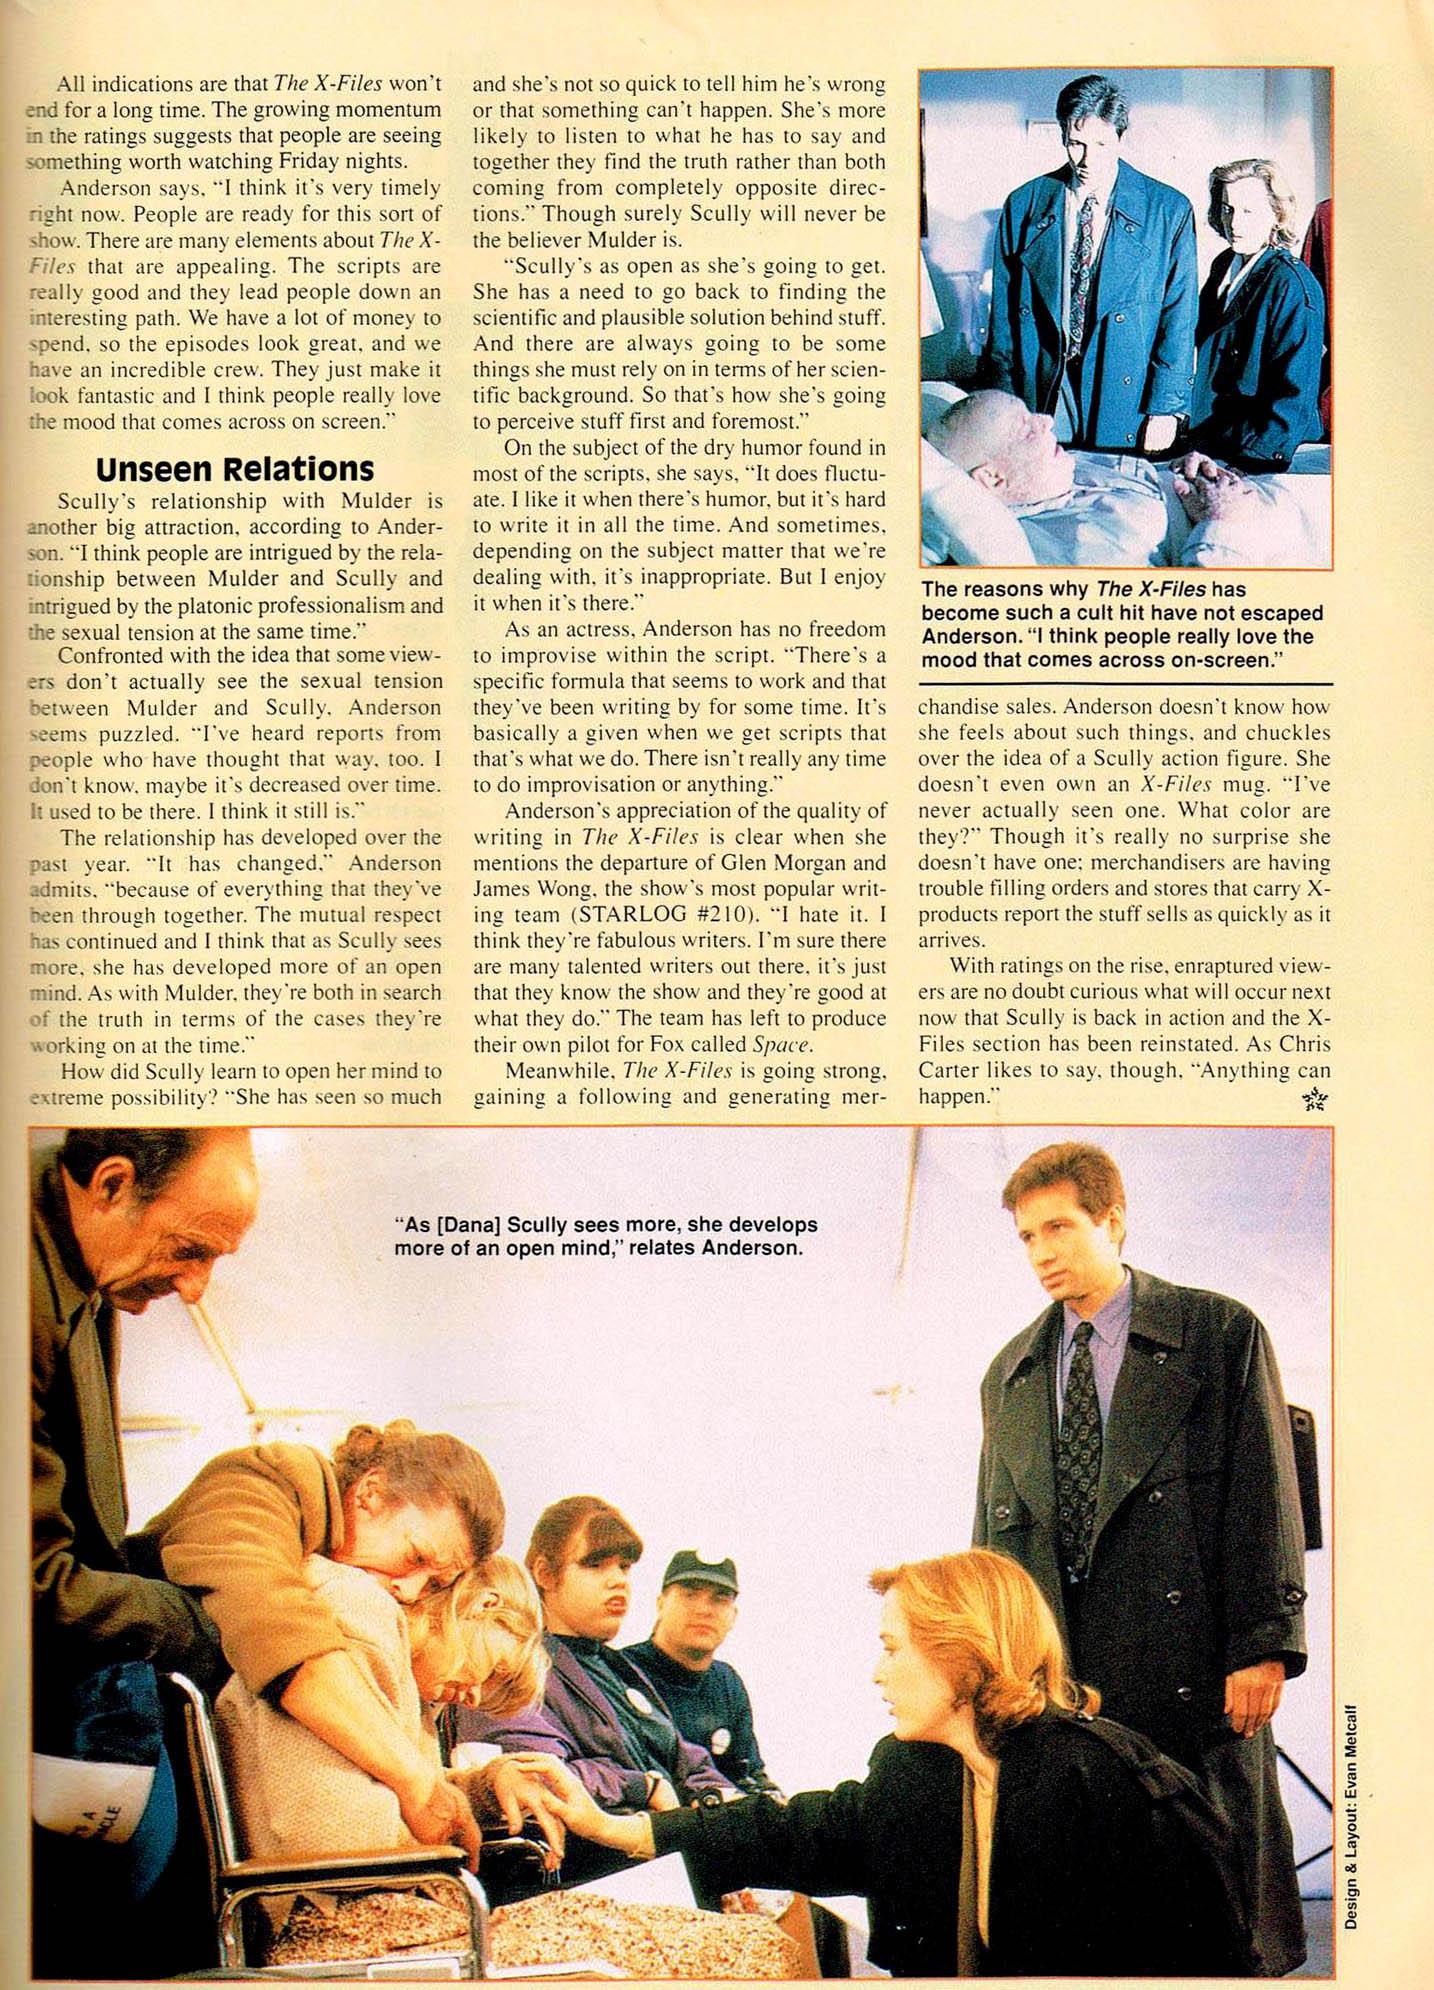 Starlog 213 1995 04 X-Files-4.jpg